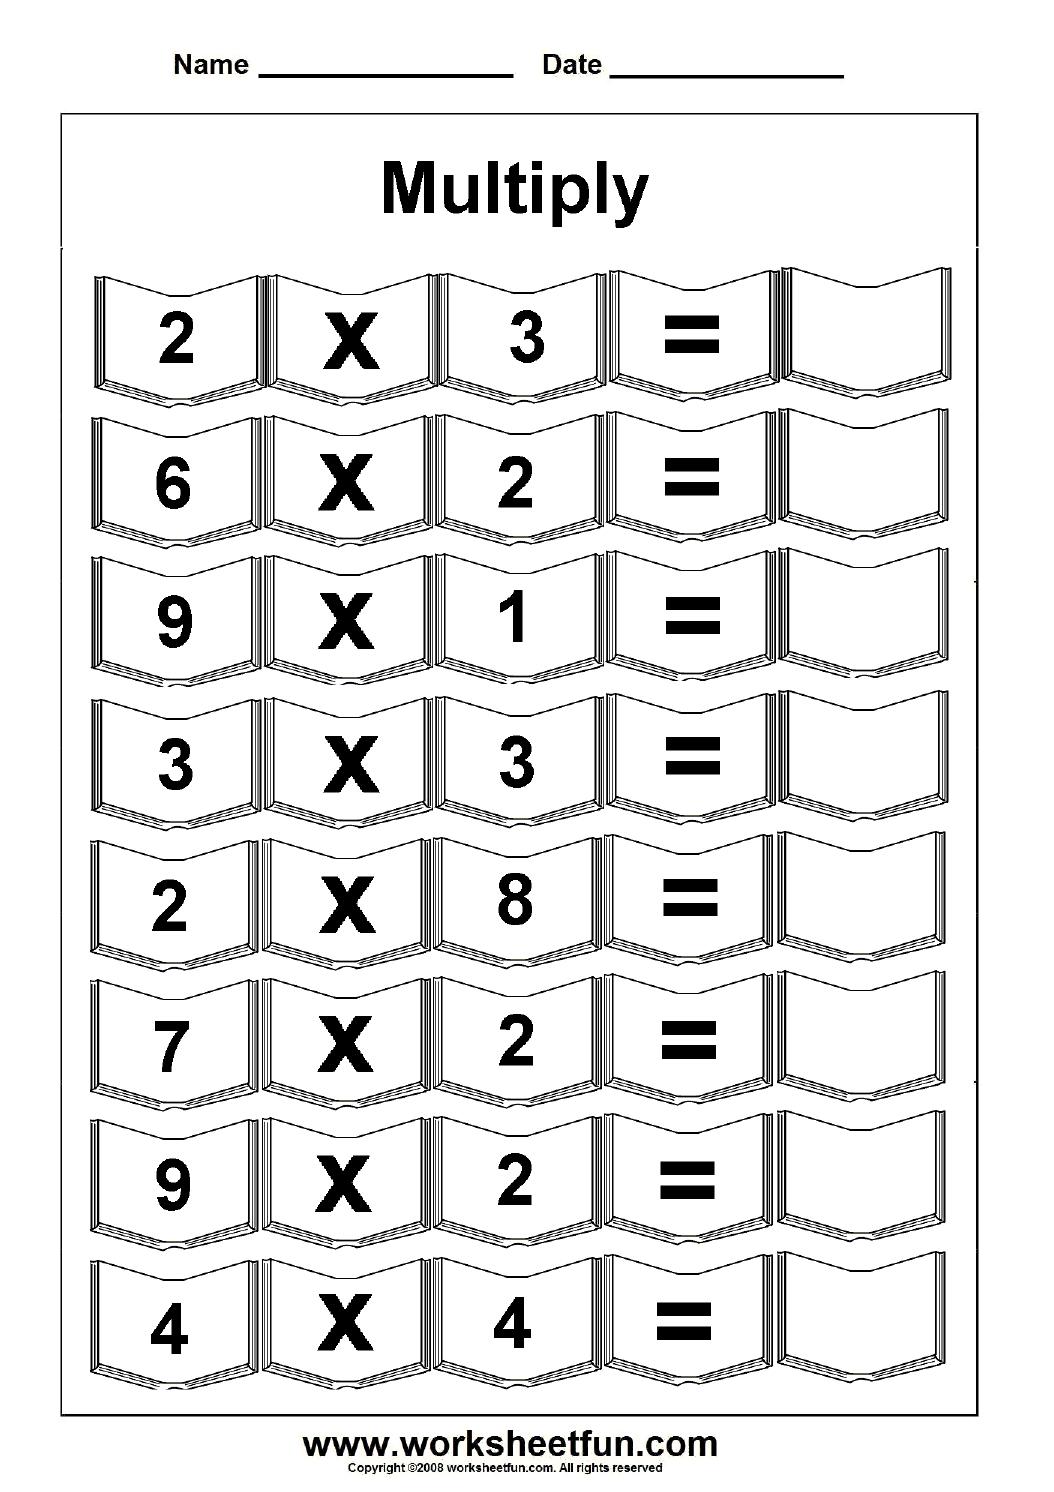 Multiplication – 5 Worksheets / Free Printable Worksheets throughout Multiplication Worksheets 5S